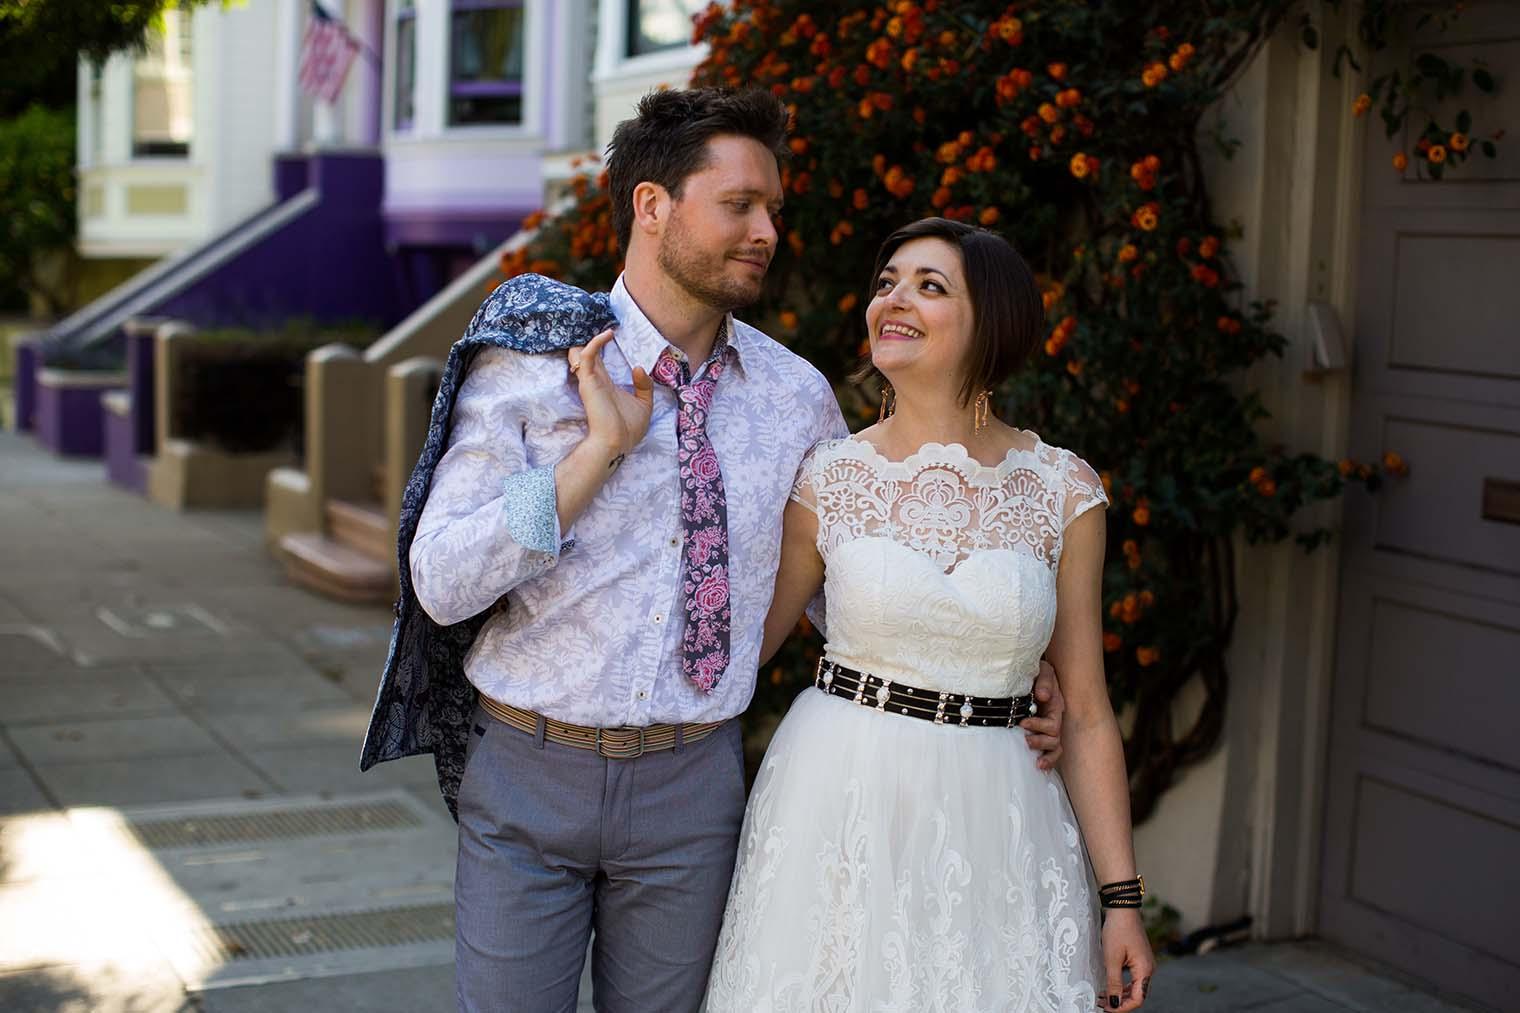 Wedding portraits taken in the Castro